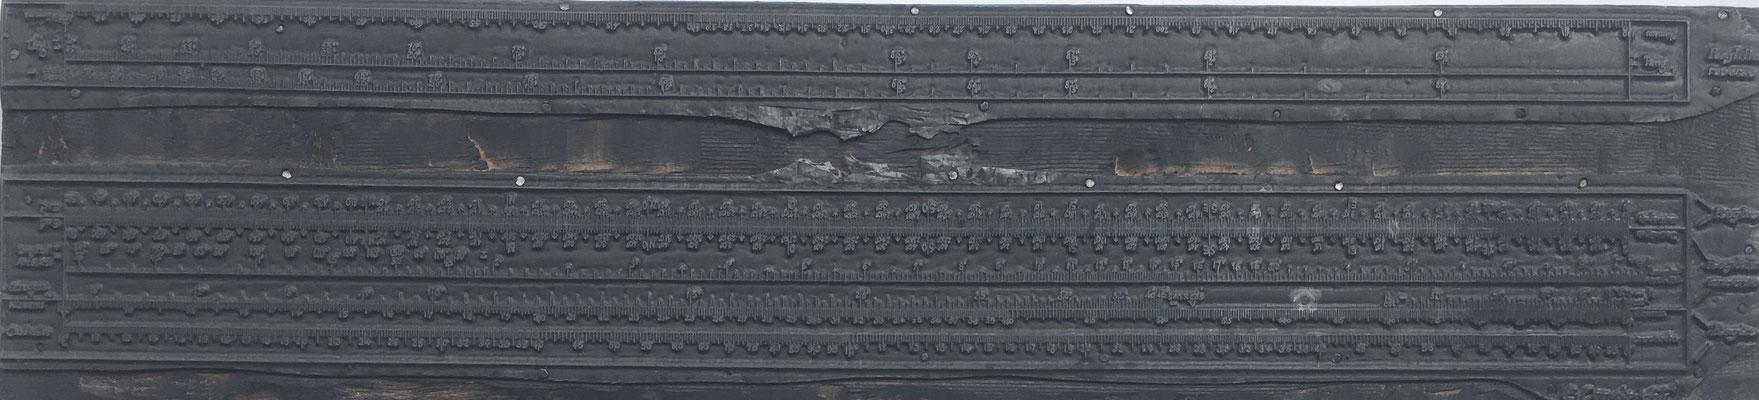 Cliché plano (matriz o plancha) de metal para tinta de la Regla E. CONDE (modelo 1), volteada